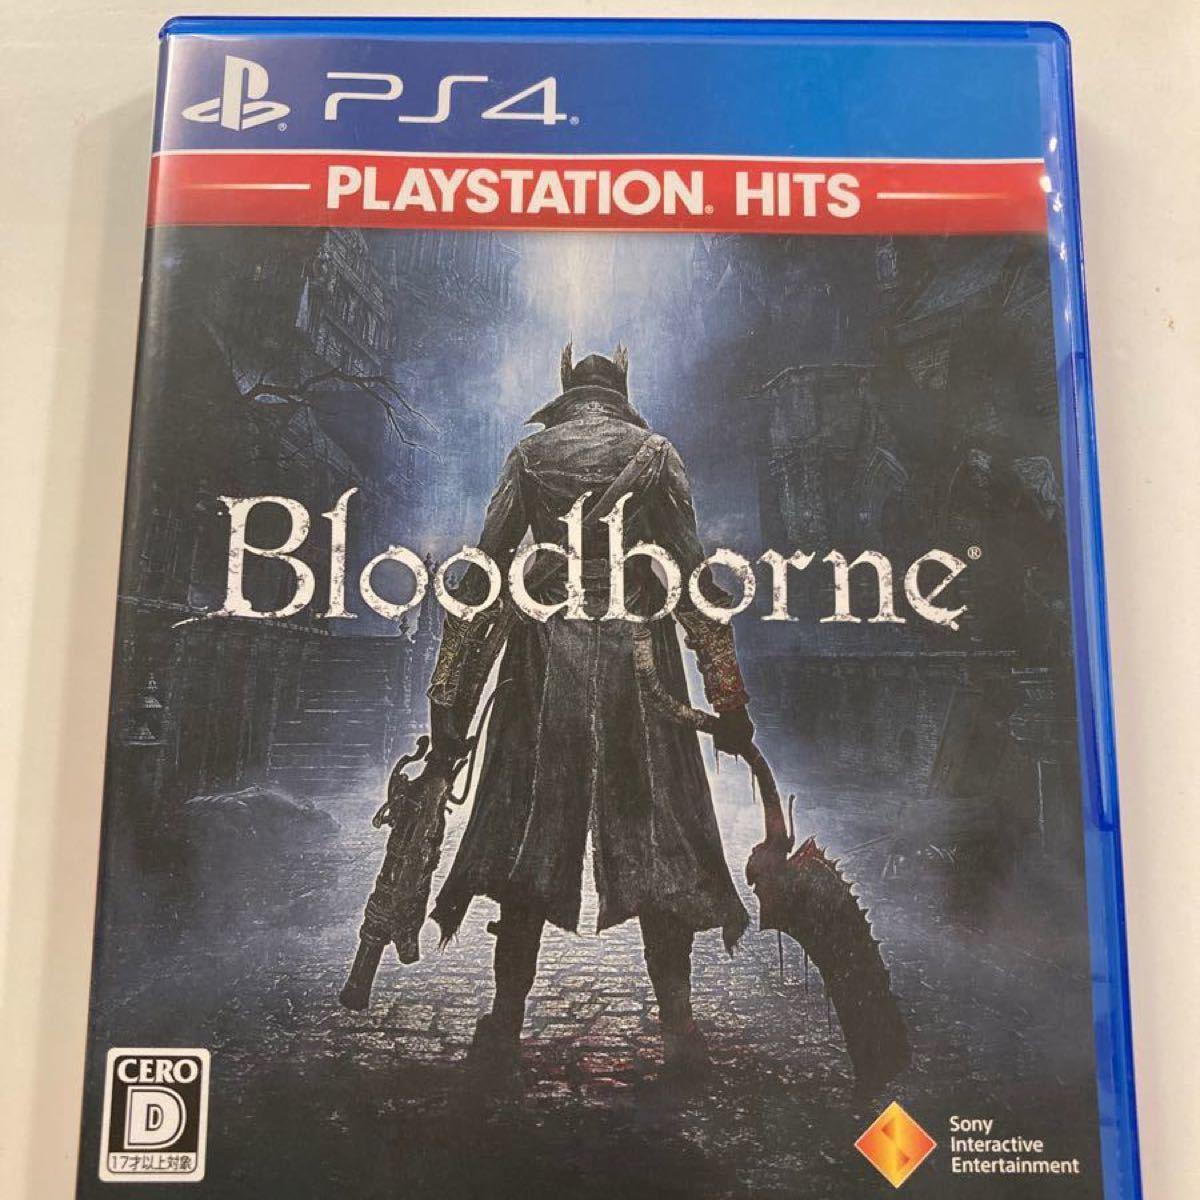 【PS4】 Bloodborne [PlayStation Hits]